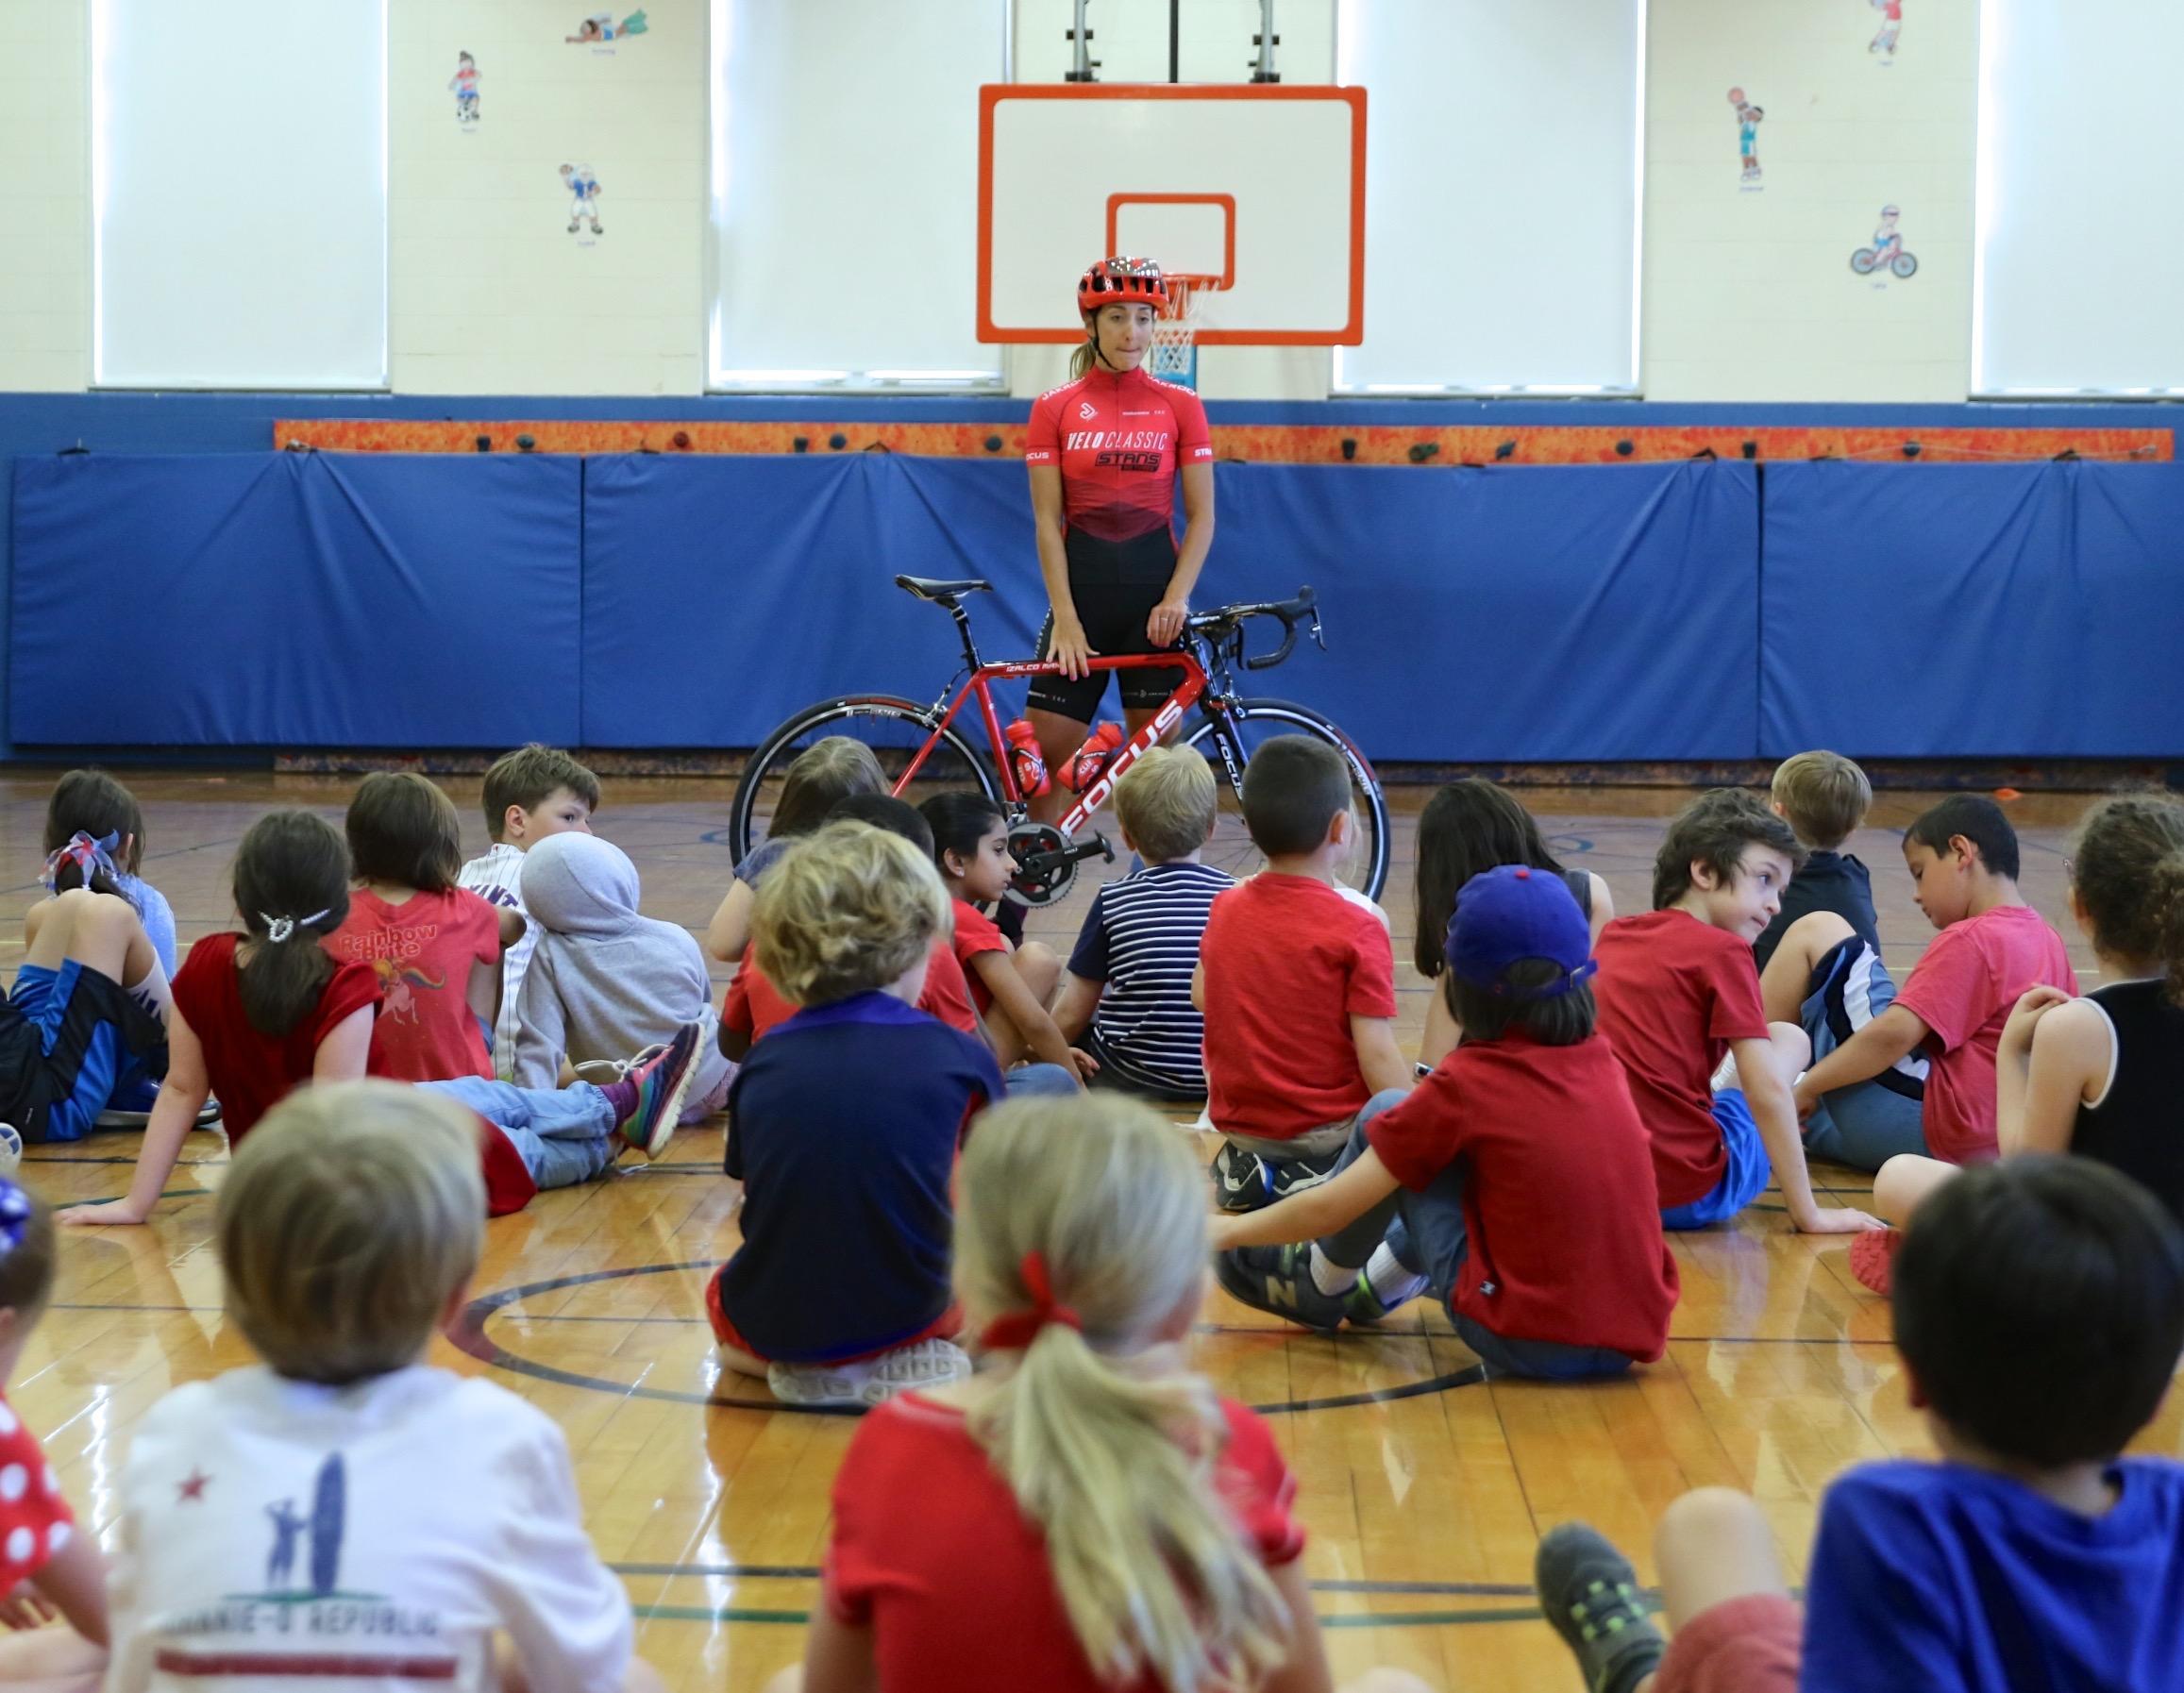 USA Crits Glencoe Grand Prix, Glencoe School Visit Lecture about bikes and bike racing - Speaker: Daphne KaragianisParticipants: 25 grade school childrenLocation: Glencoe, IL